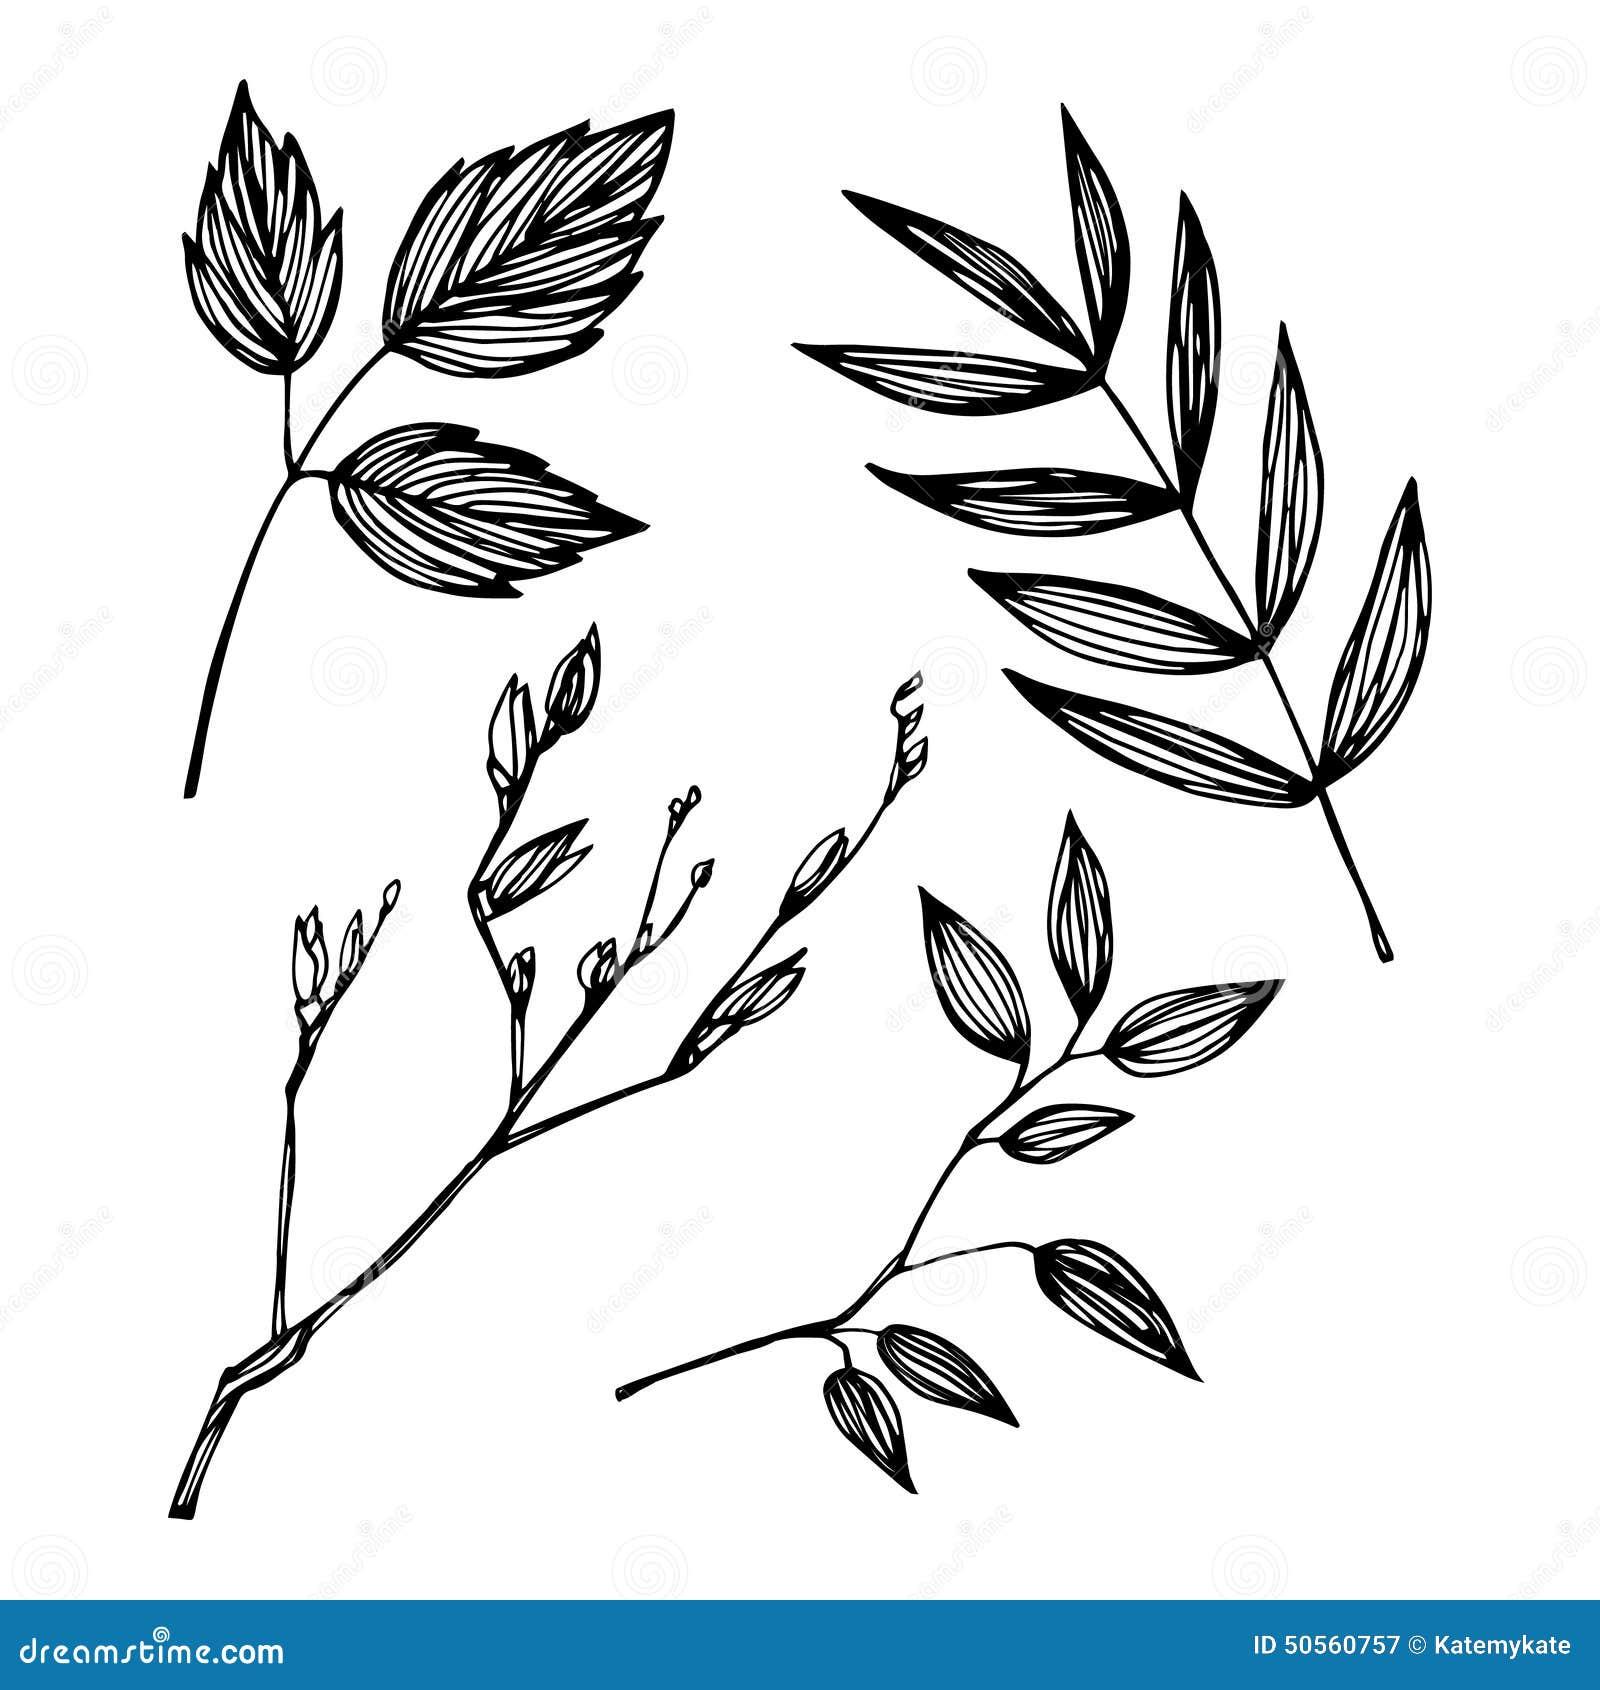 Hand-drawn Vector Illustration